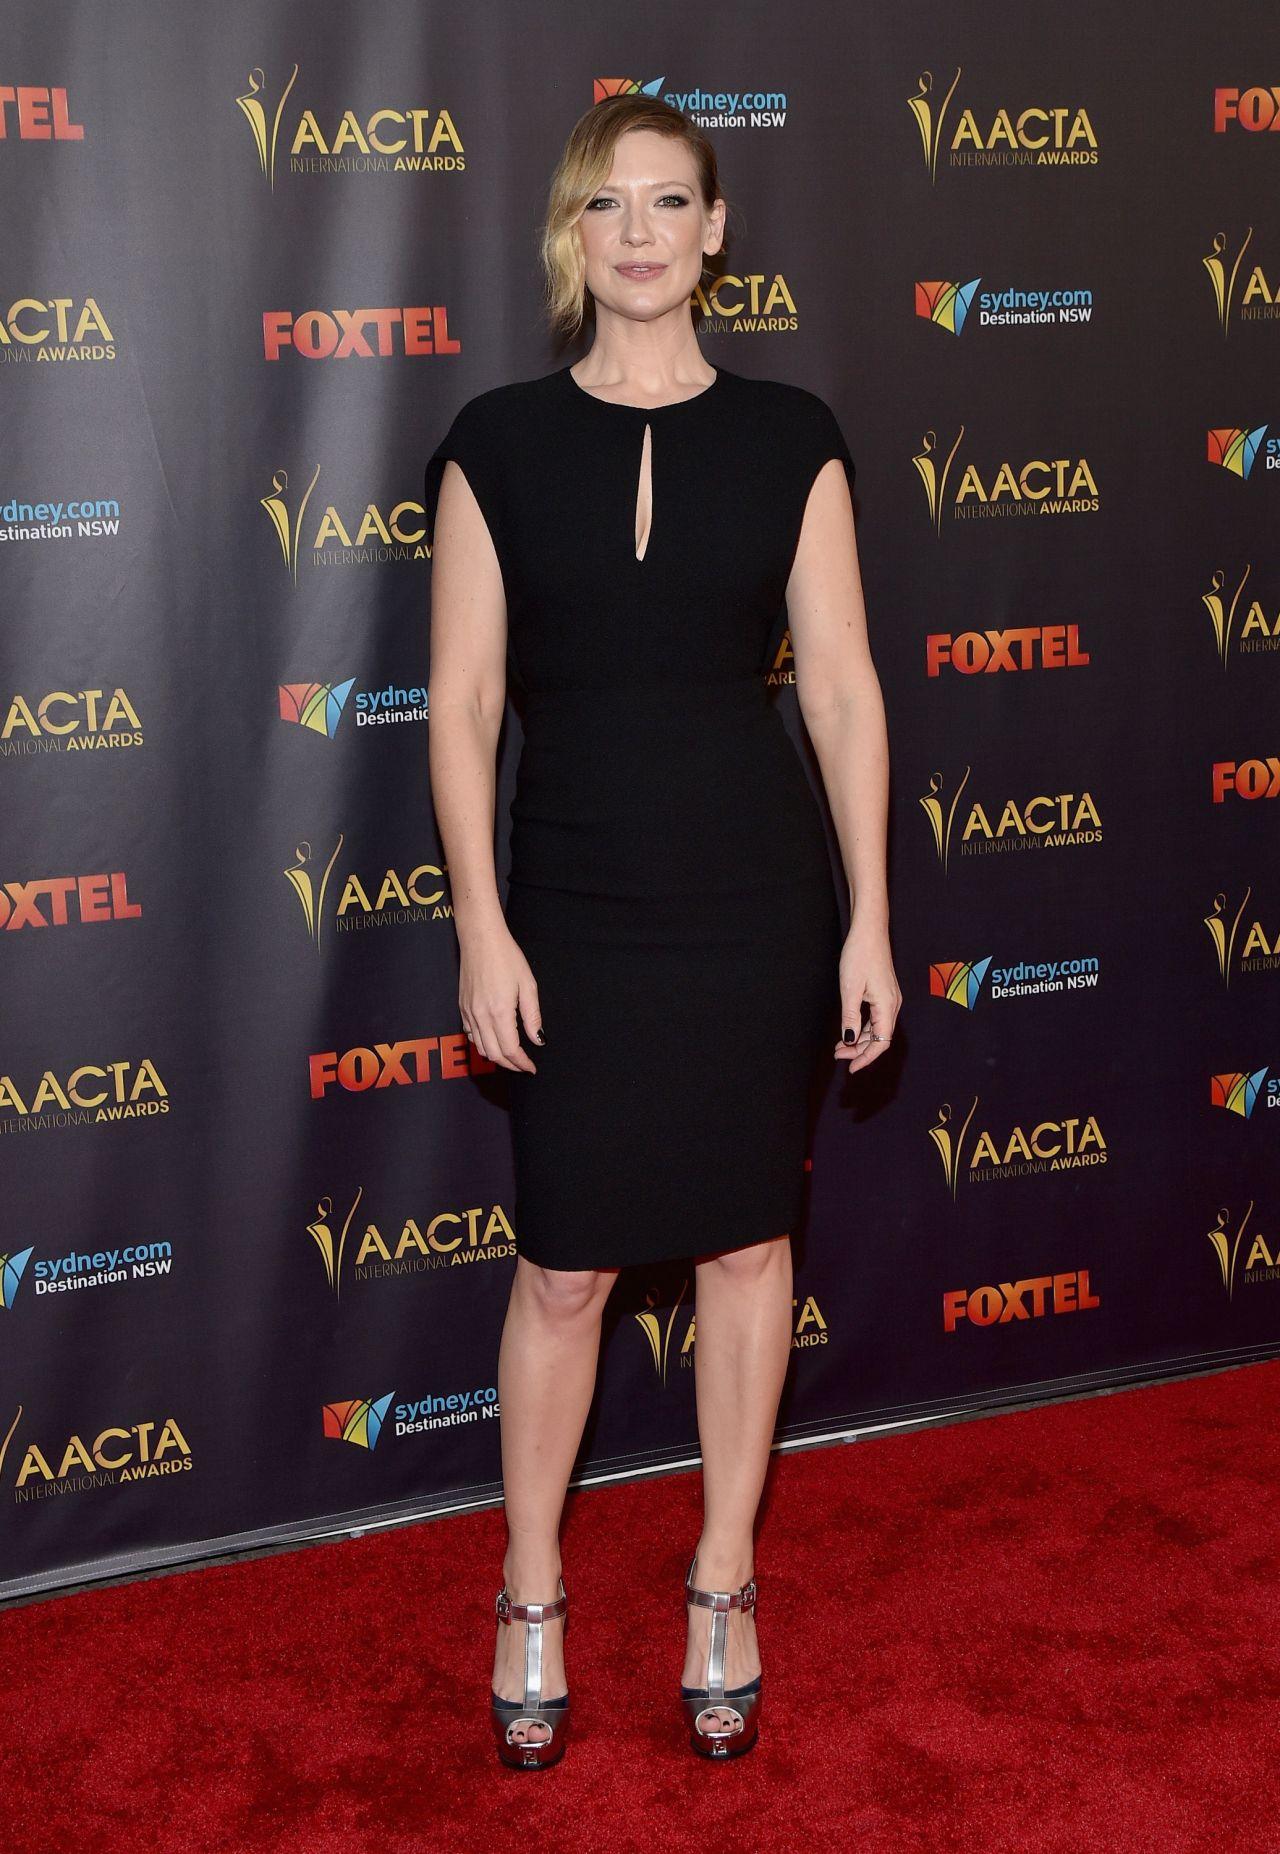 2015 Los Angeles Film Festival: 2015 AACTA International Awards Ceremony In